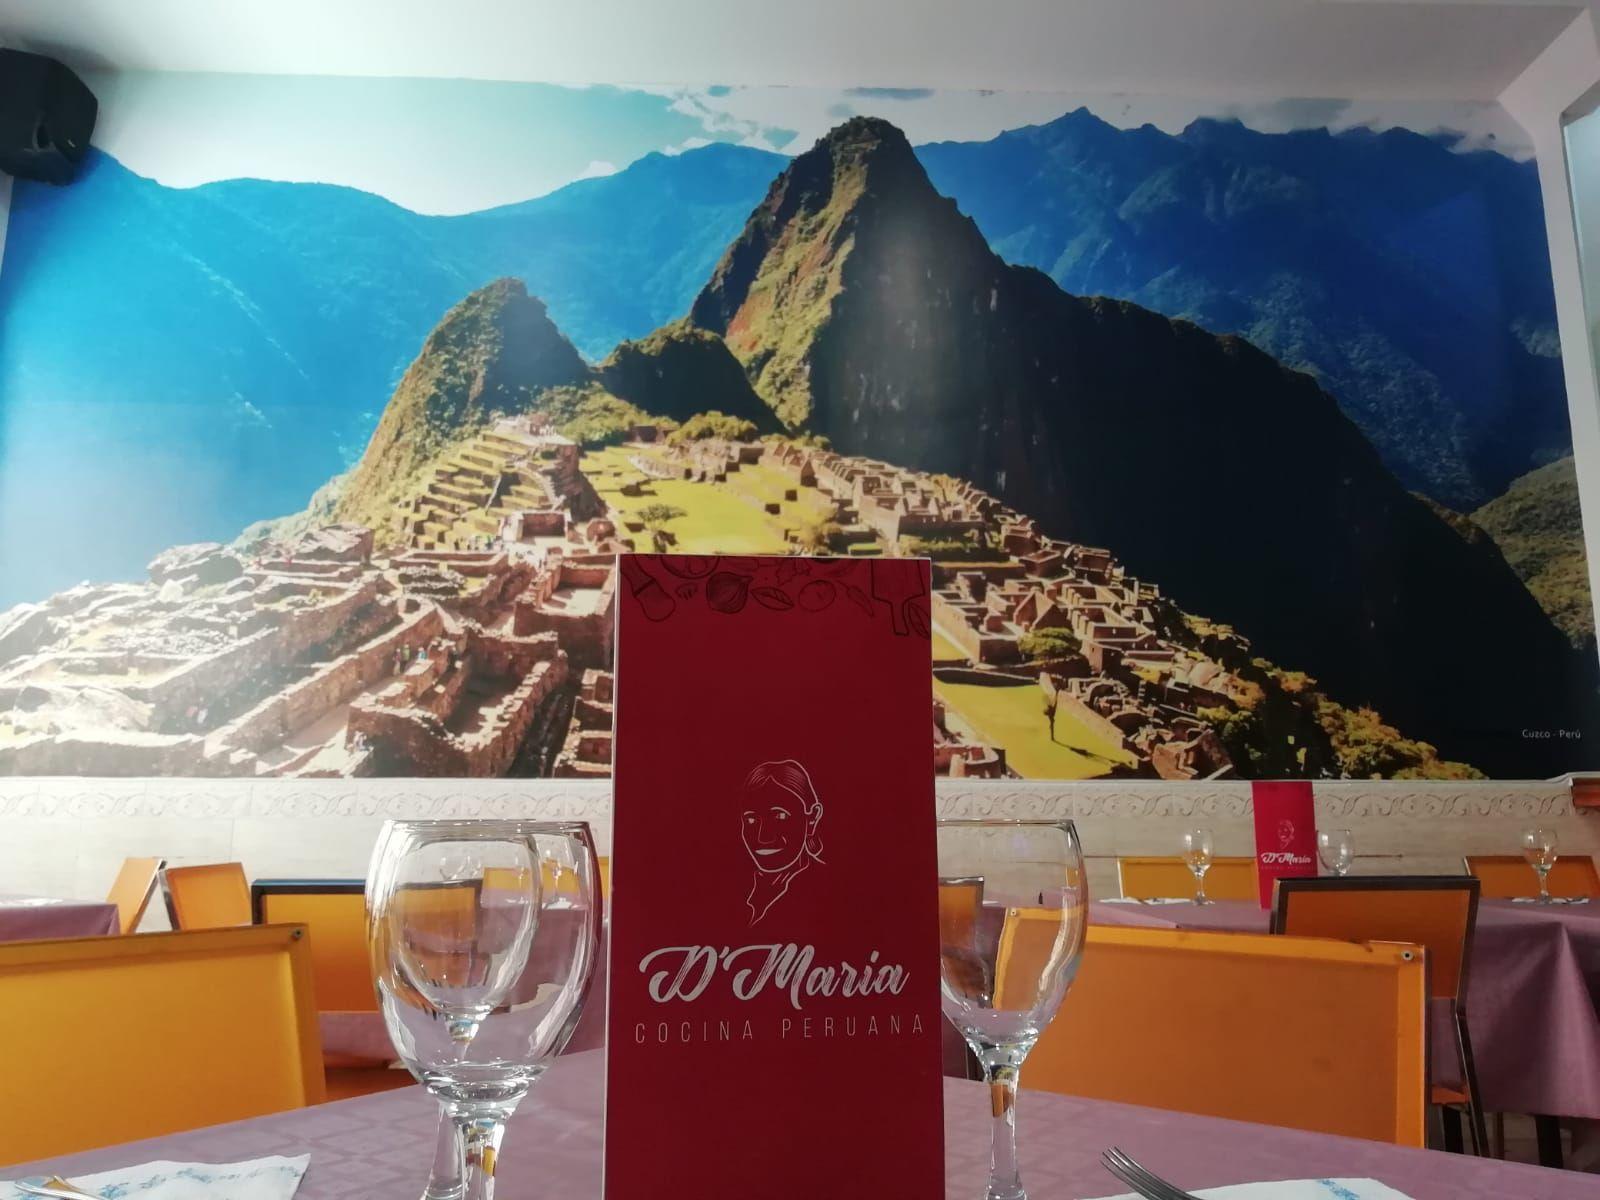 Foto 136 de Cocina peruana en    TIKA MARIYA